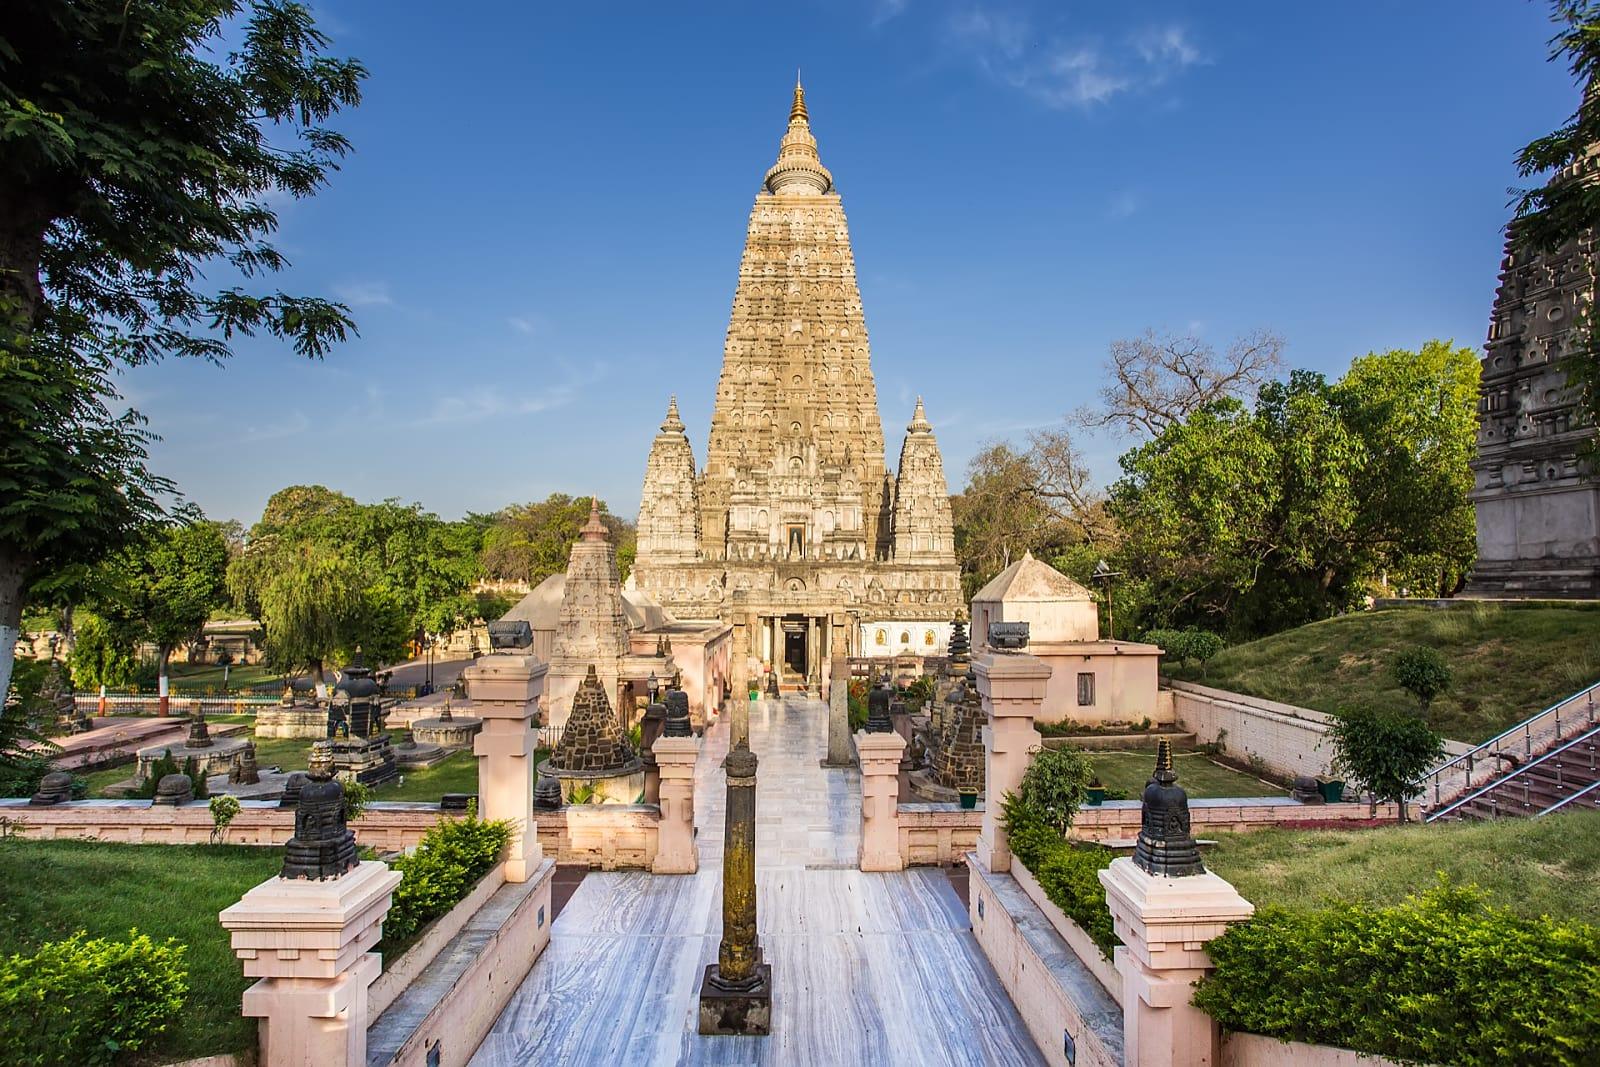 Bodhgaya and Mahabodhi Temple